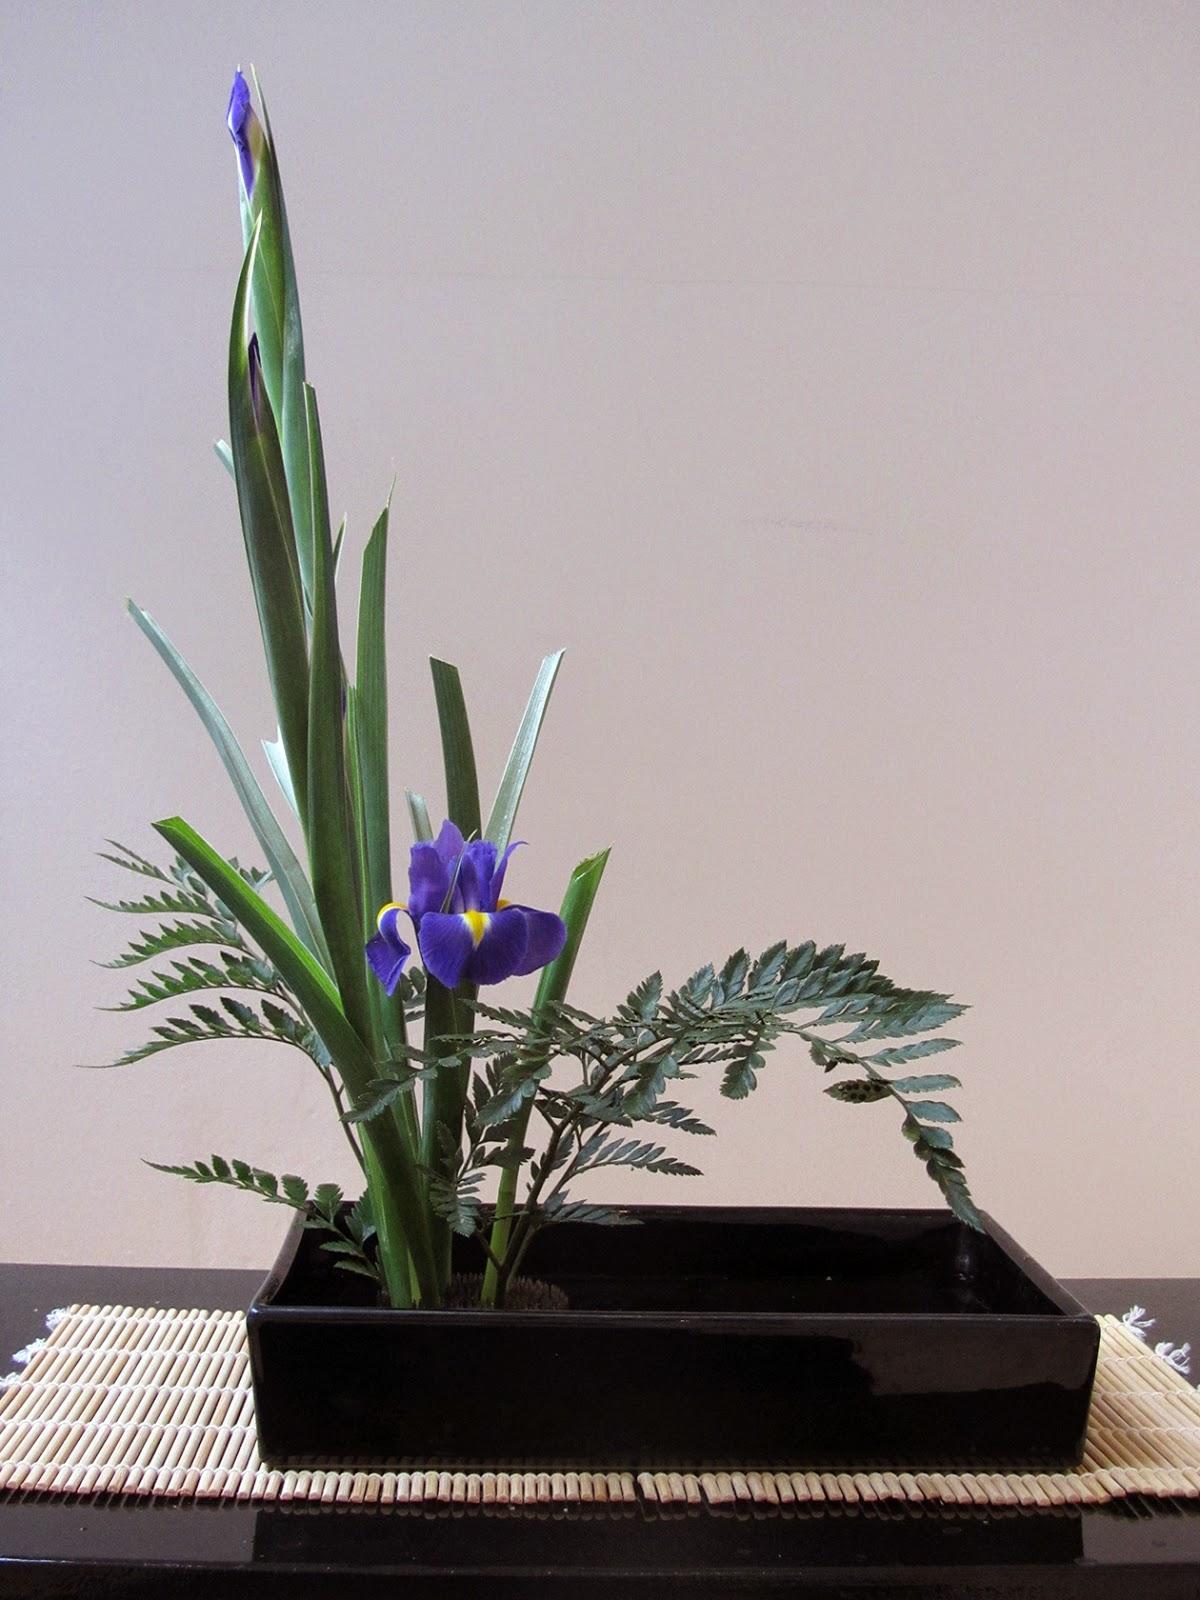 kado arrangement